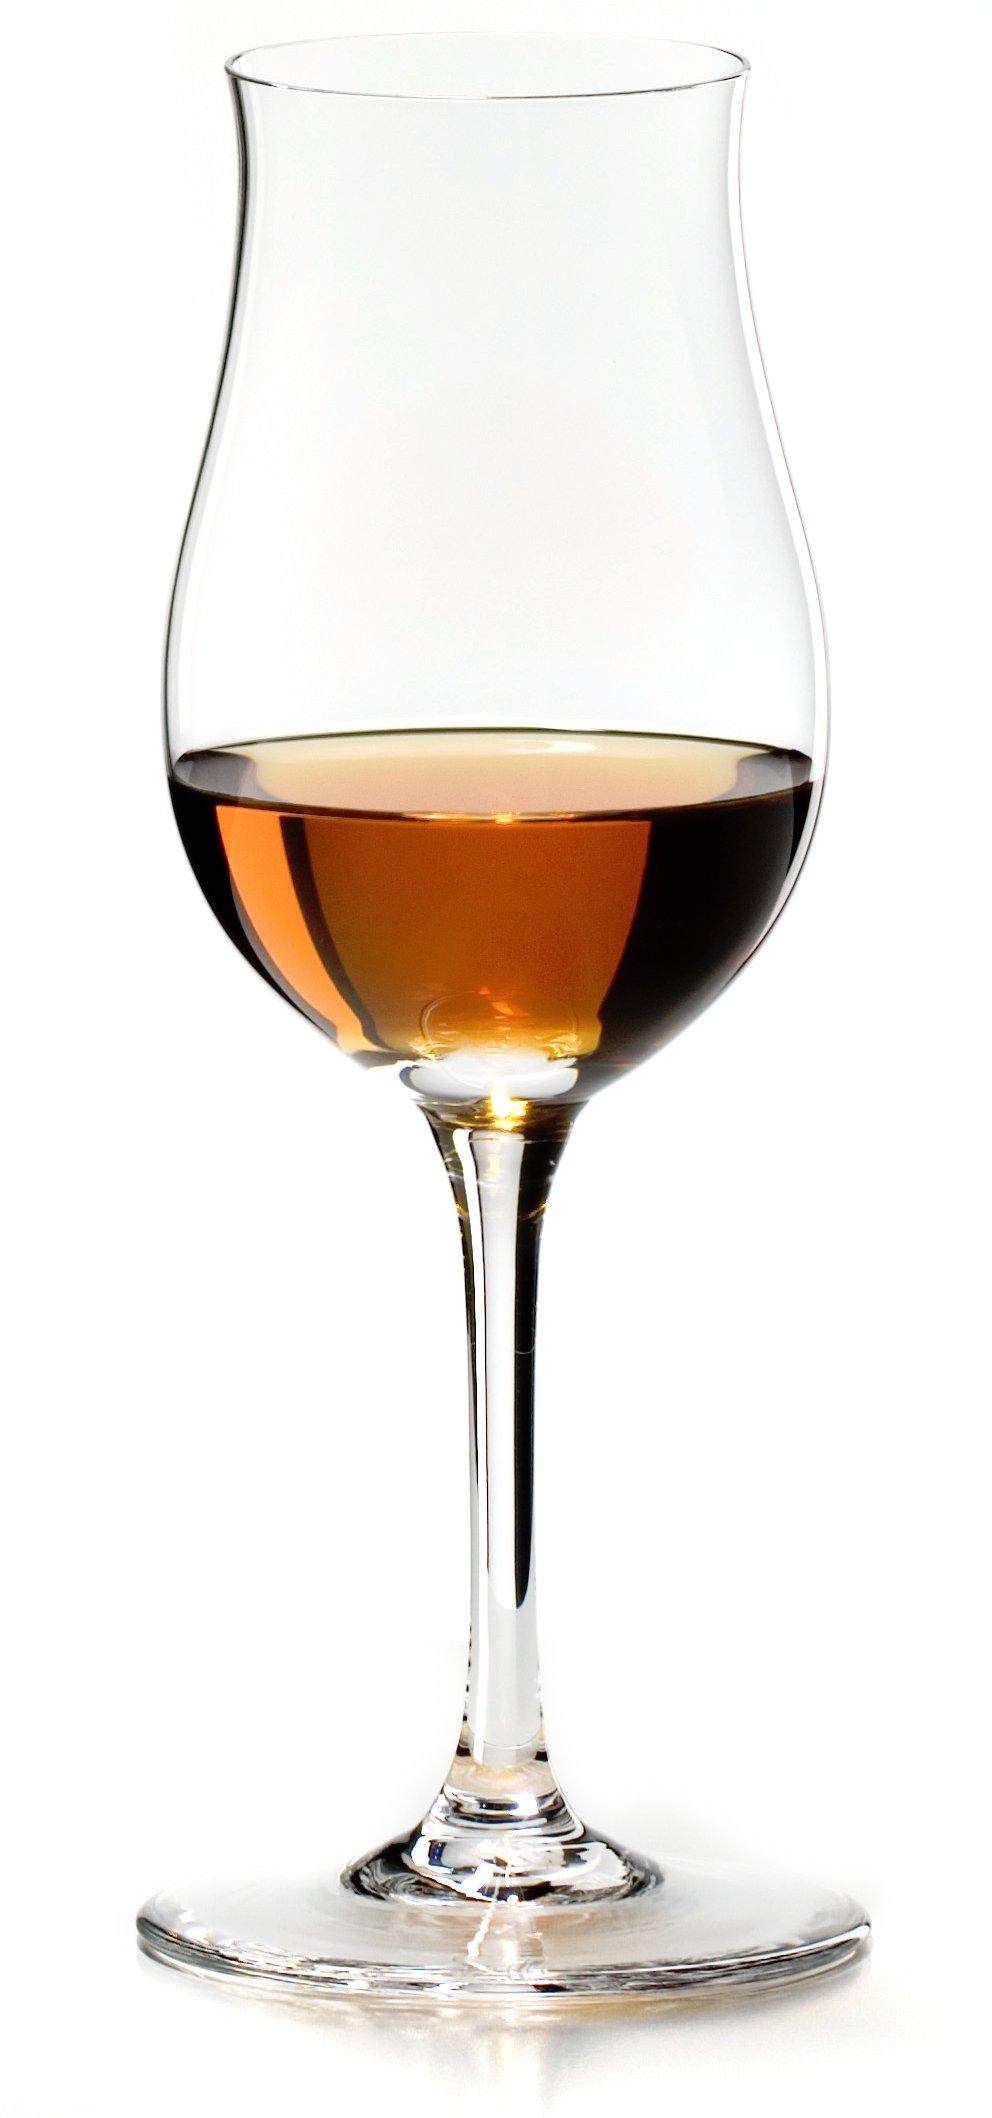 Riedel Sommeliers Cognac VSOP Glass